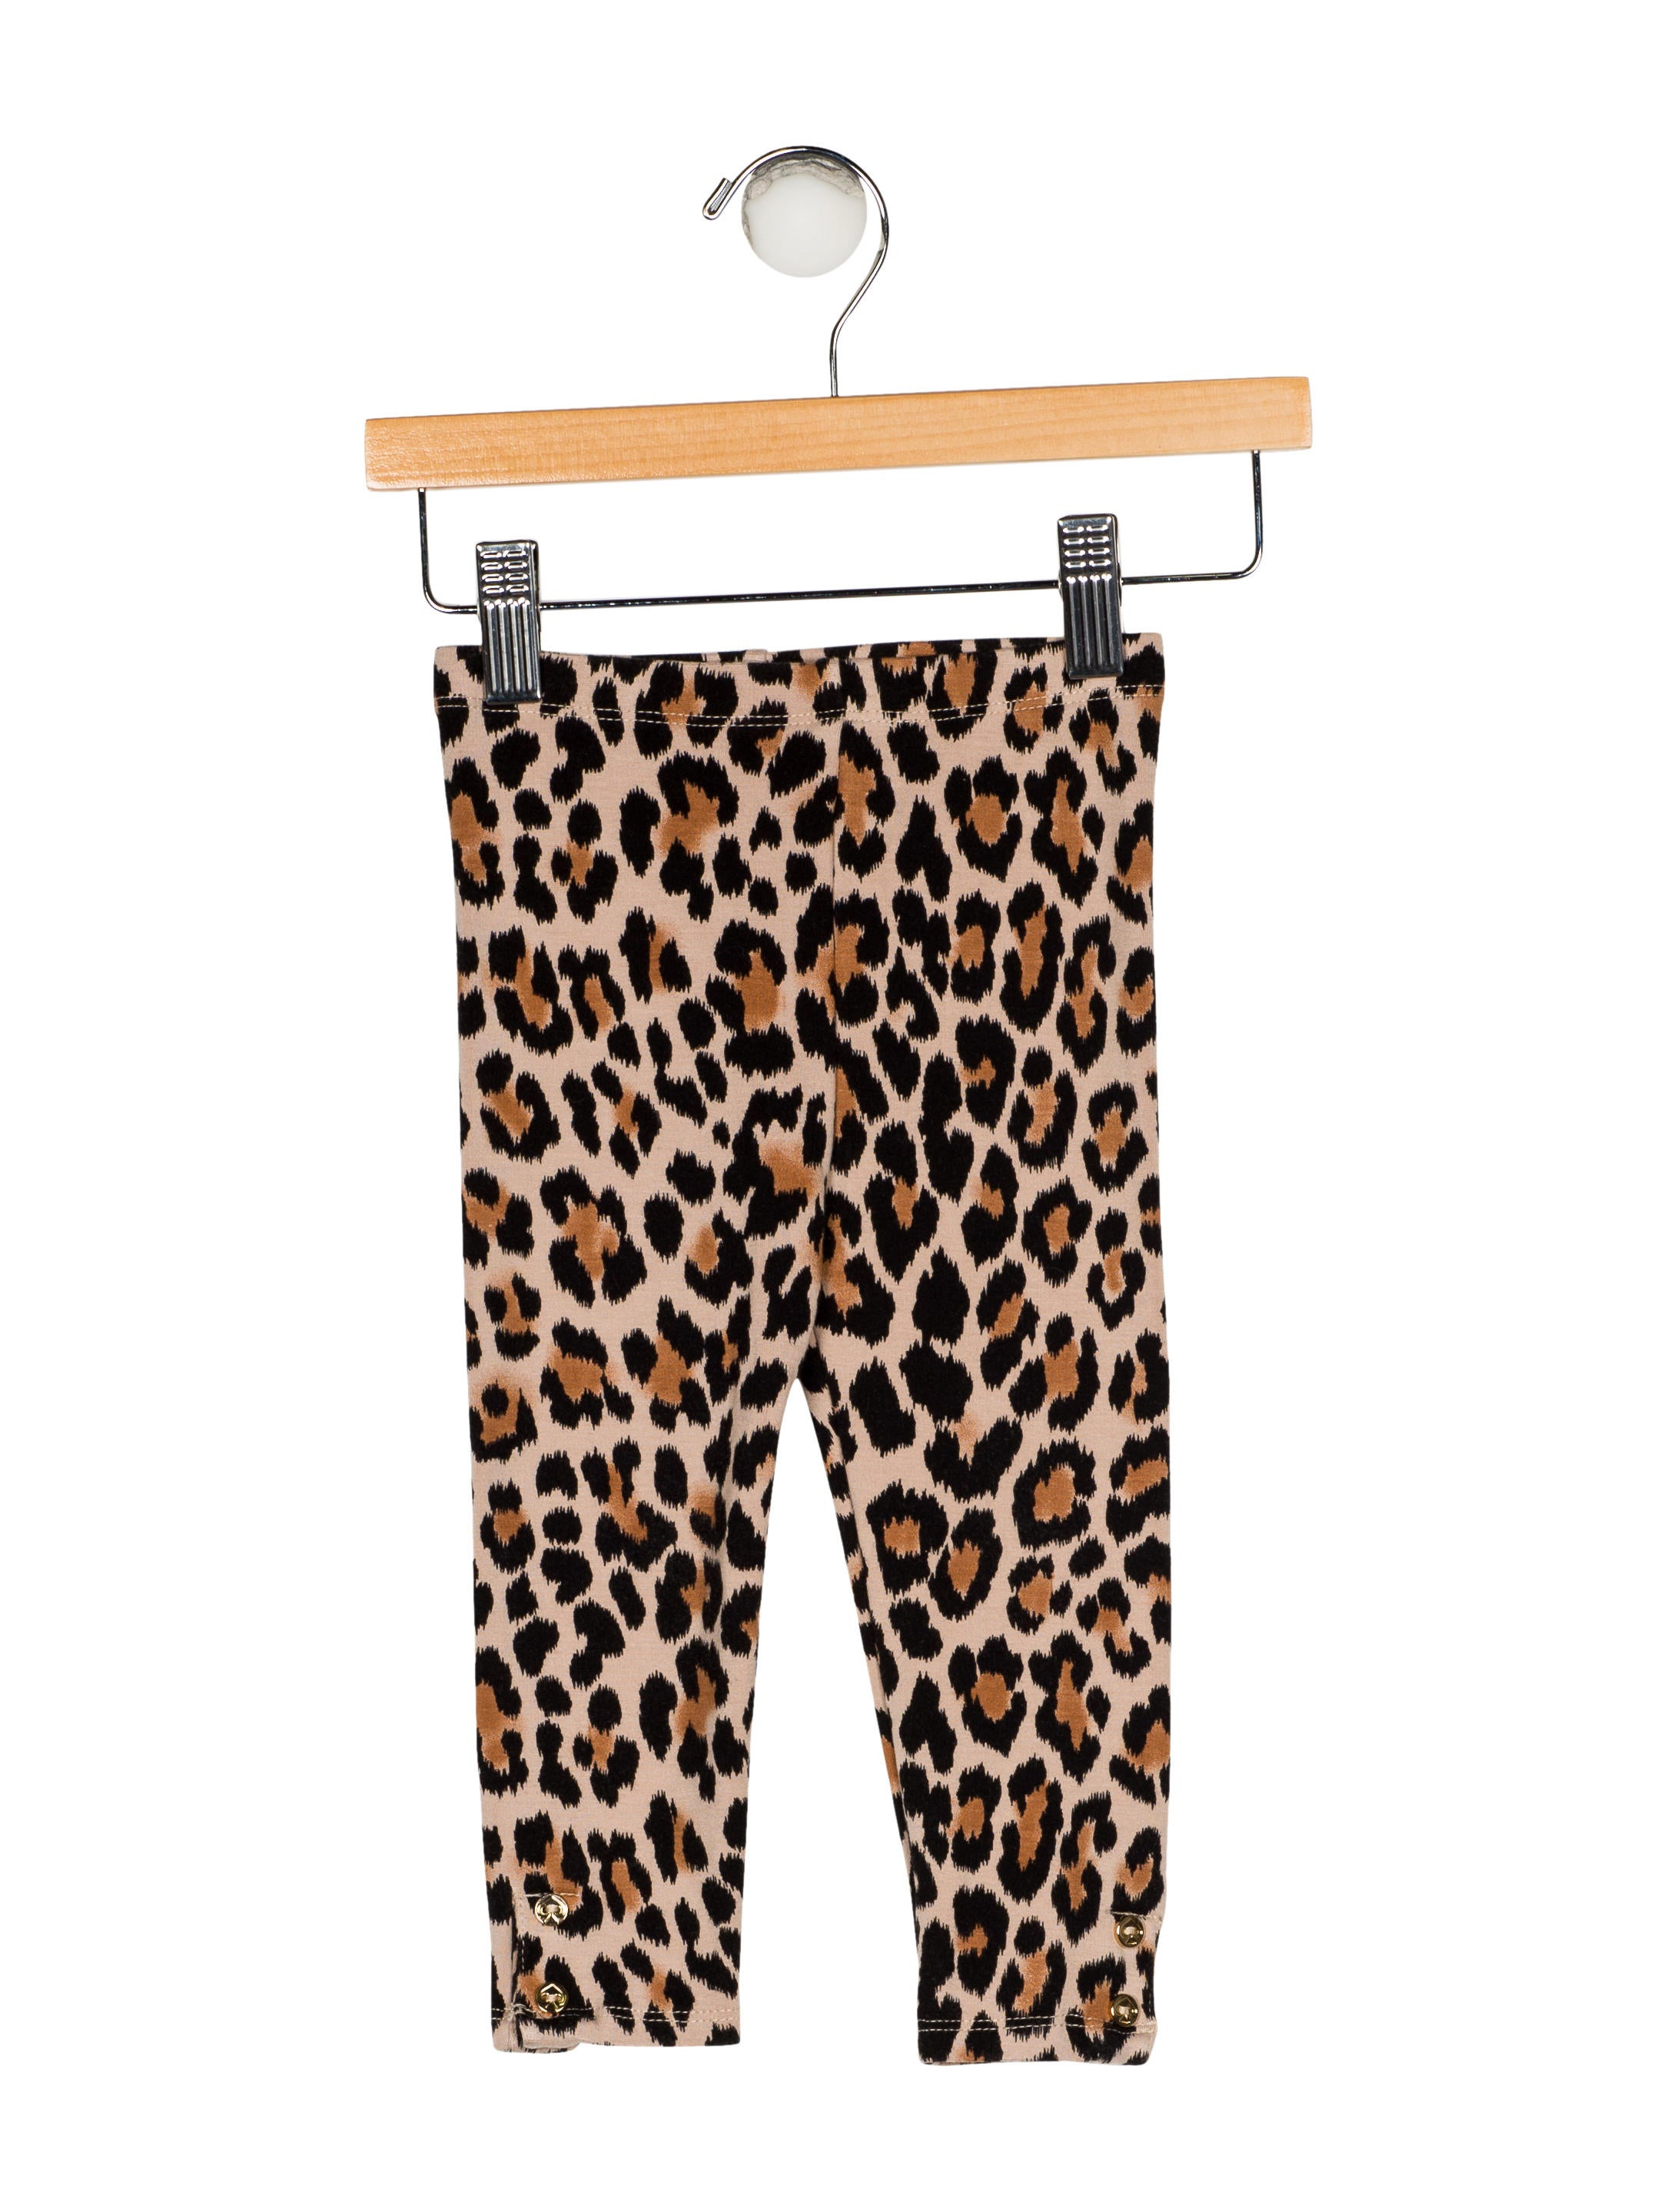 d809846ca2744 Kate Spade New York Girls' Leopard Print Leggings - Girls ...